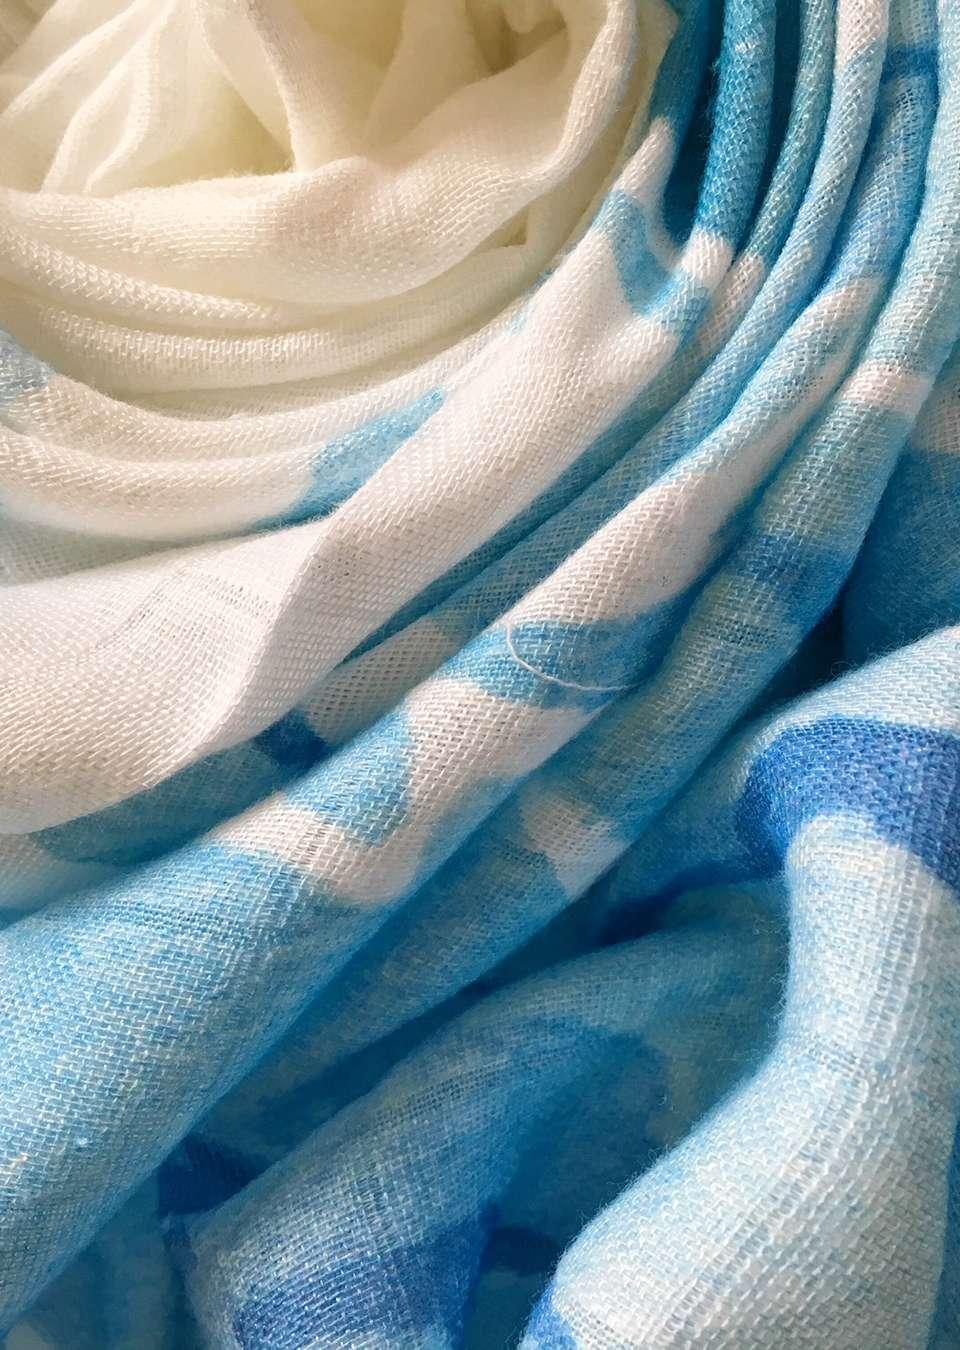 Муслиновая пеленка. Фотопеленка. Волна